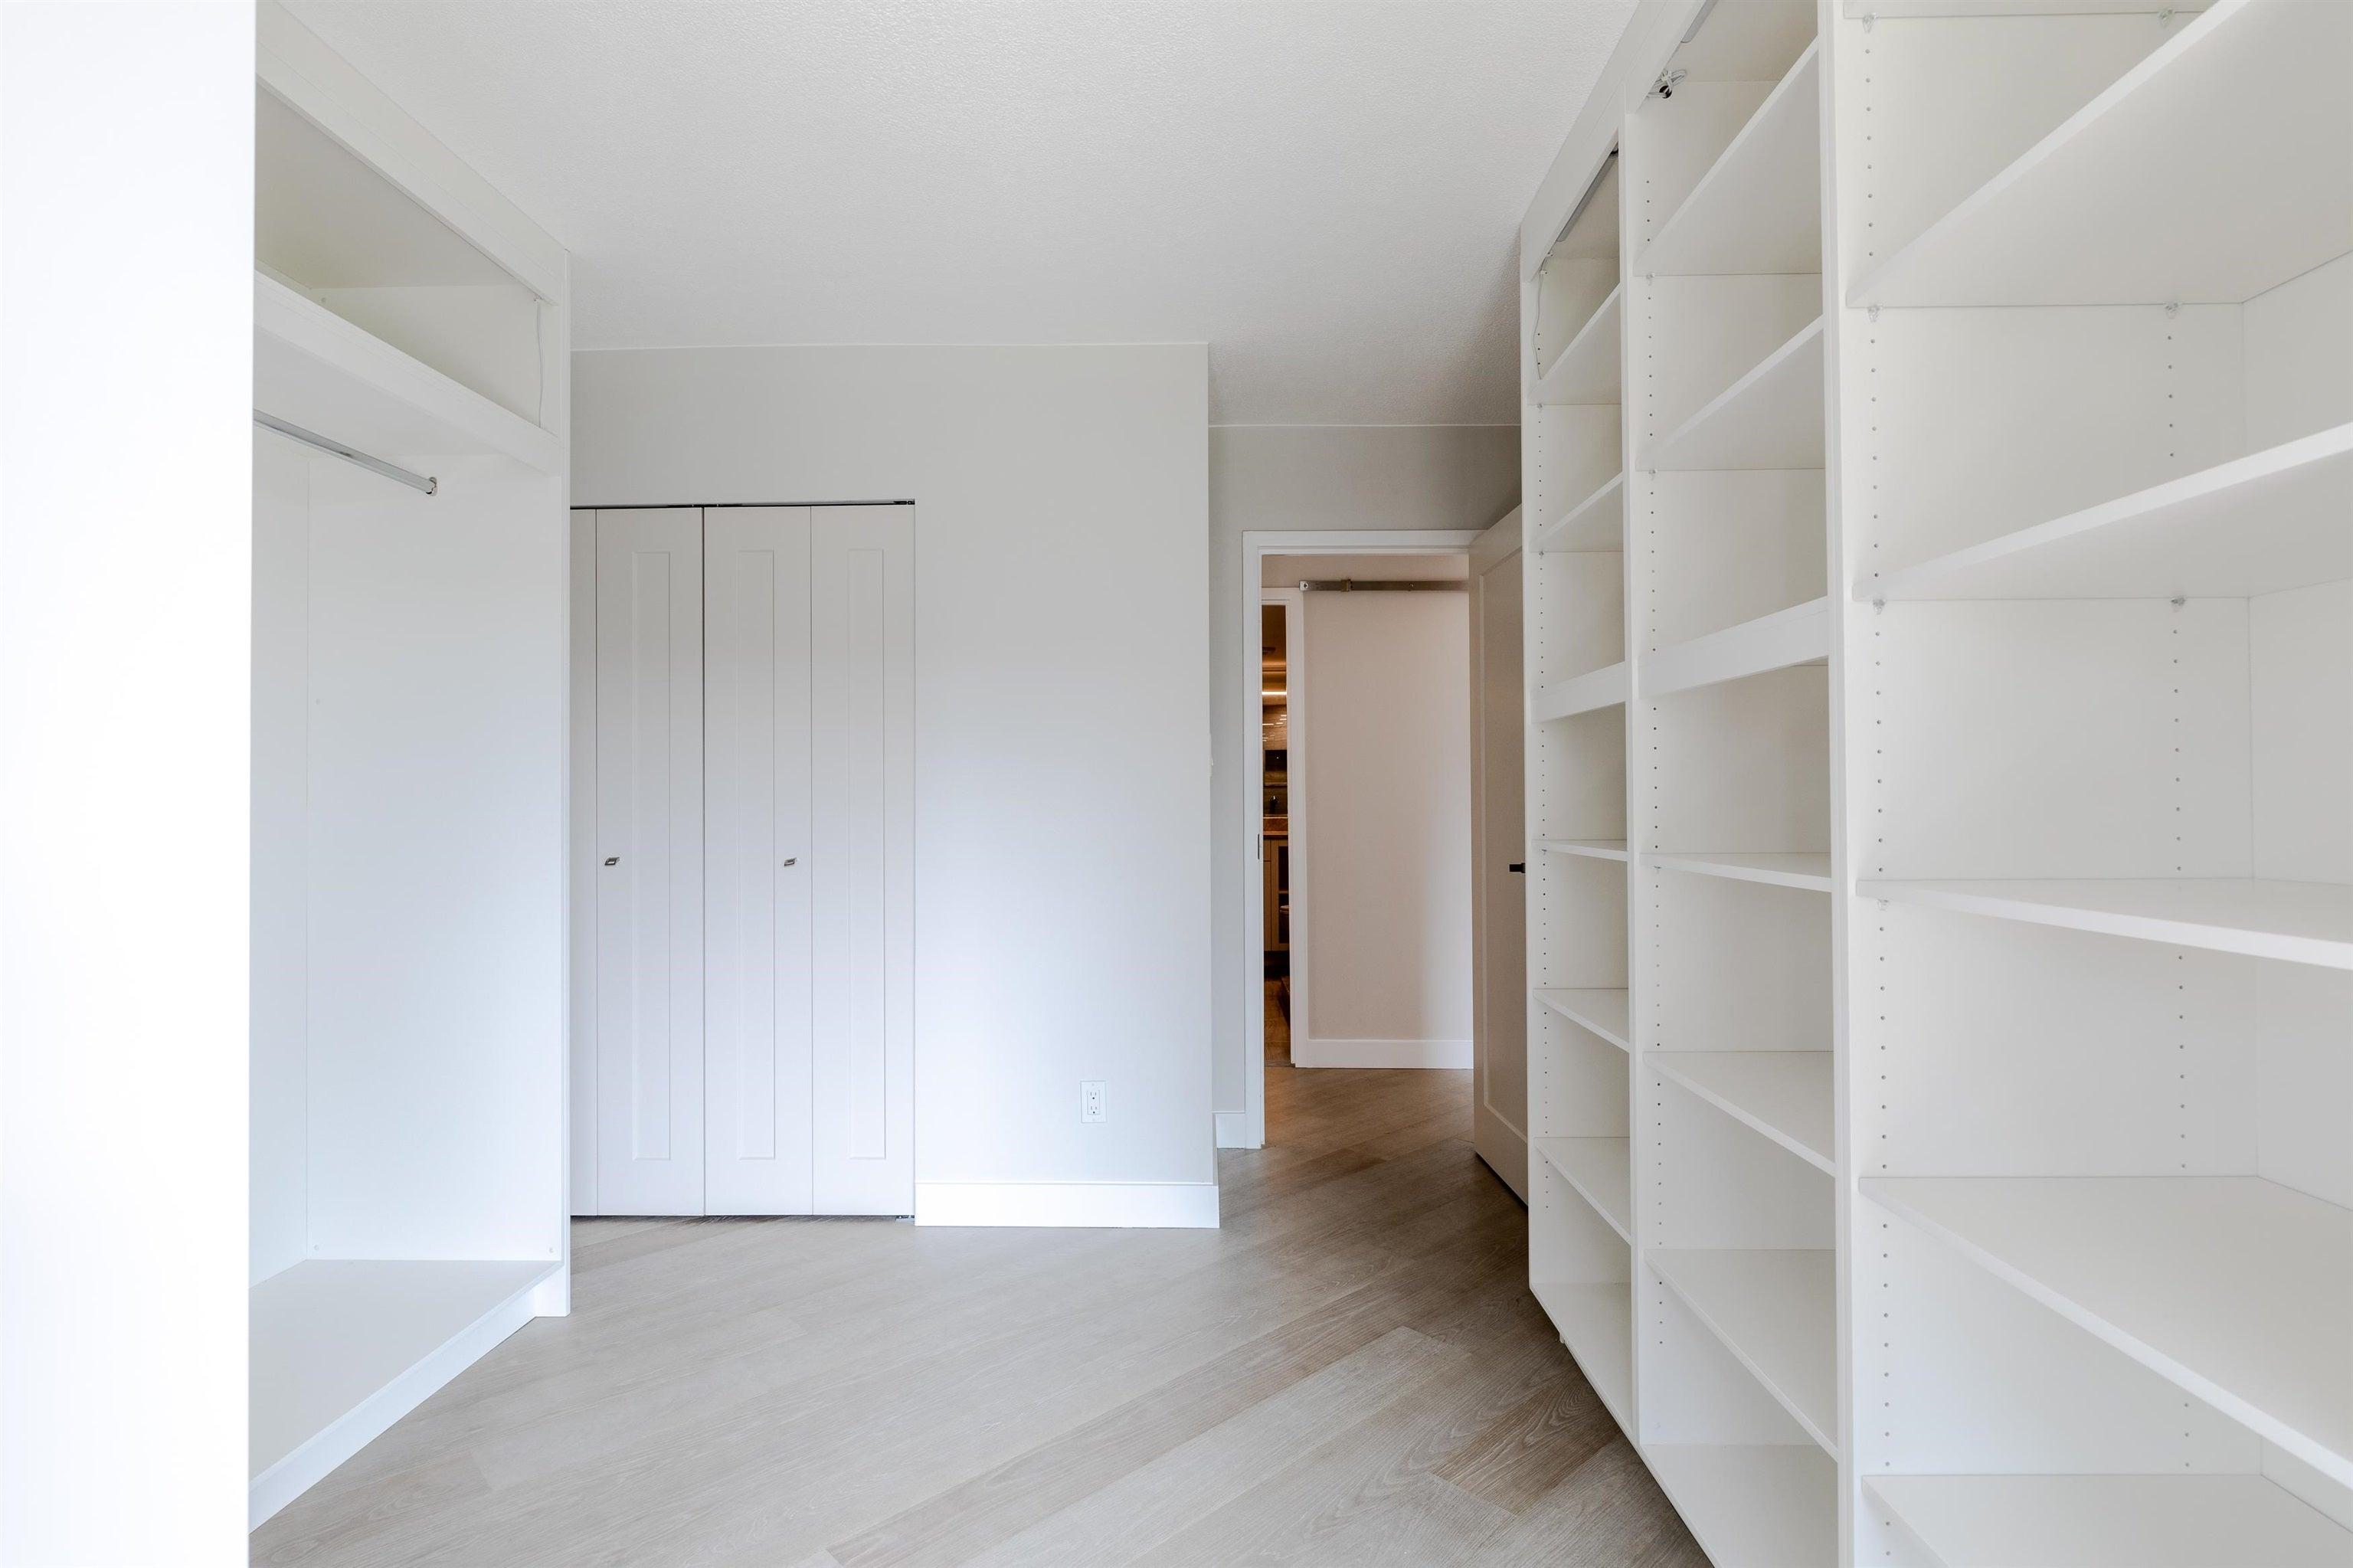 406 1450 PENNYFARTHING DRIVE - False Creek Apartment/Condo for sale, 2 Bedrooms (R2617259) - #19